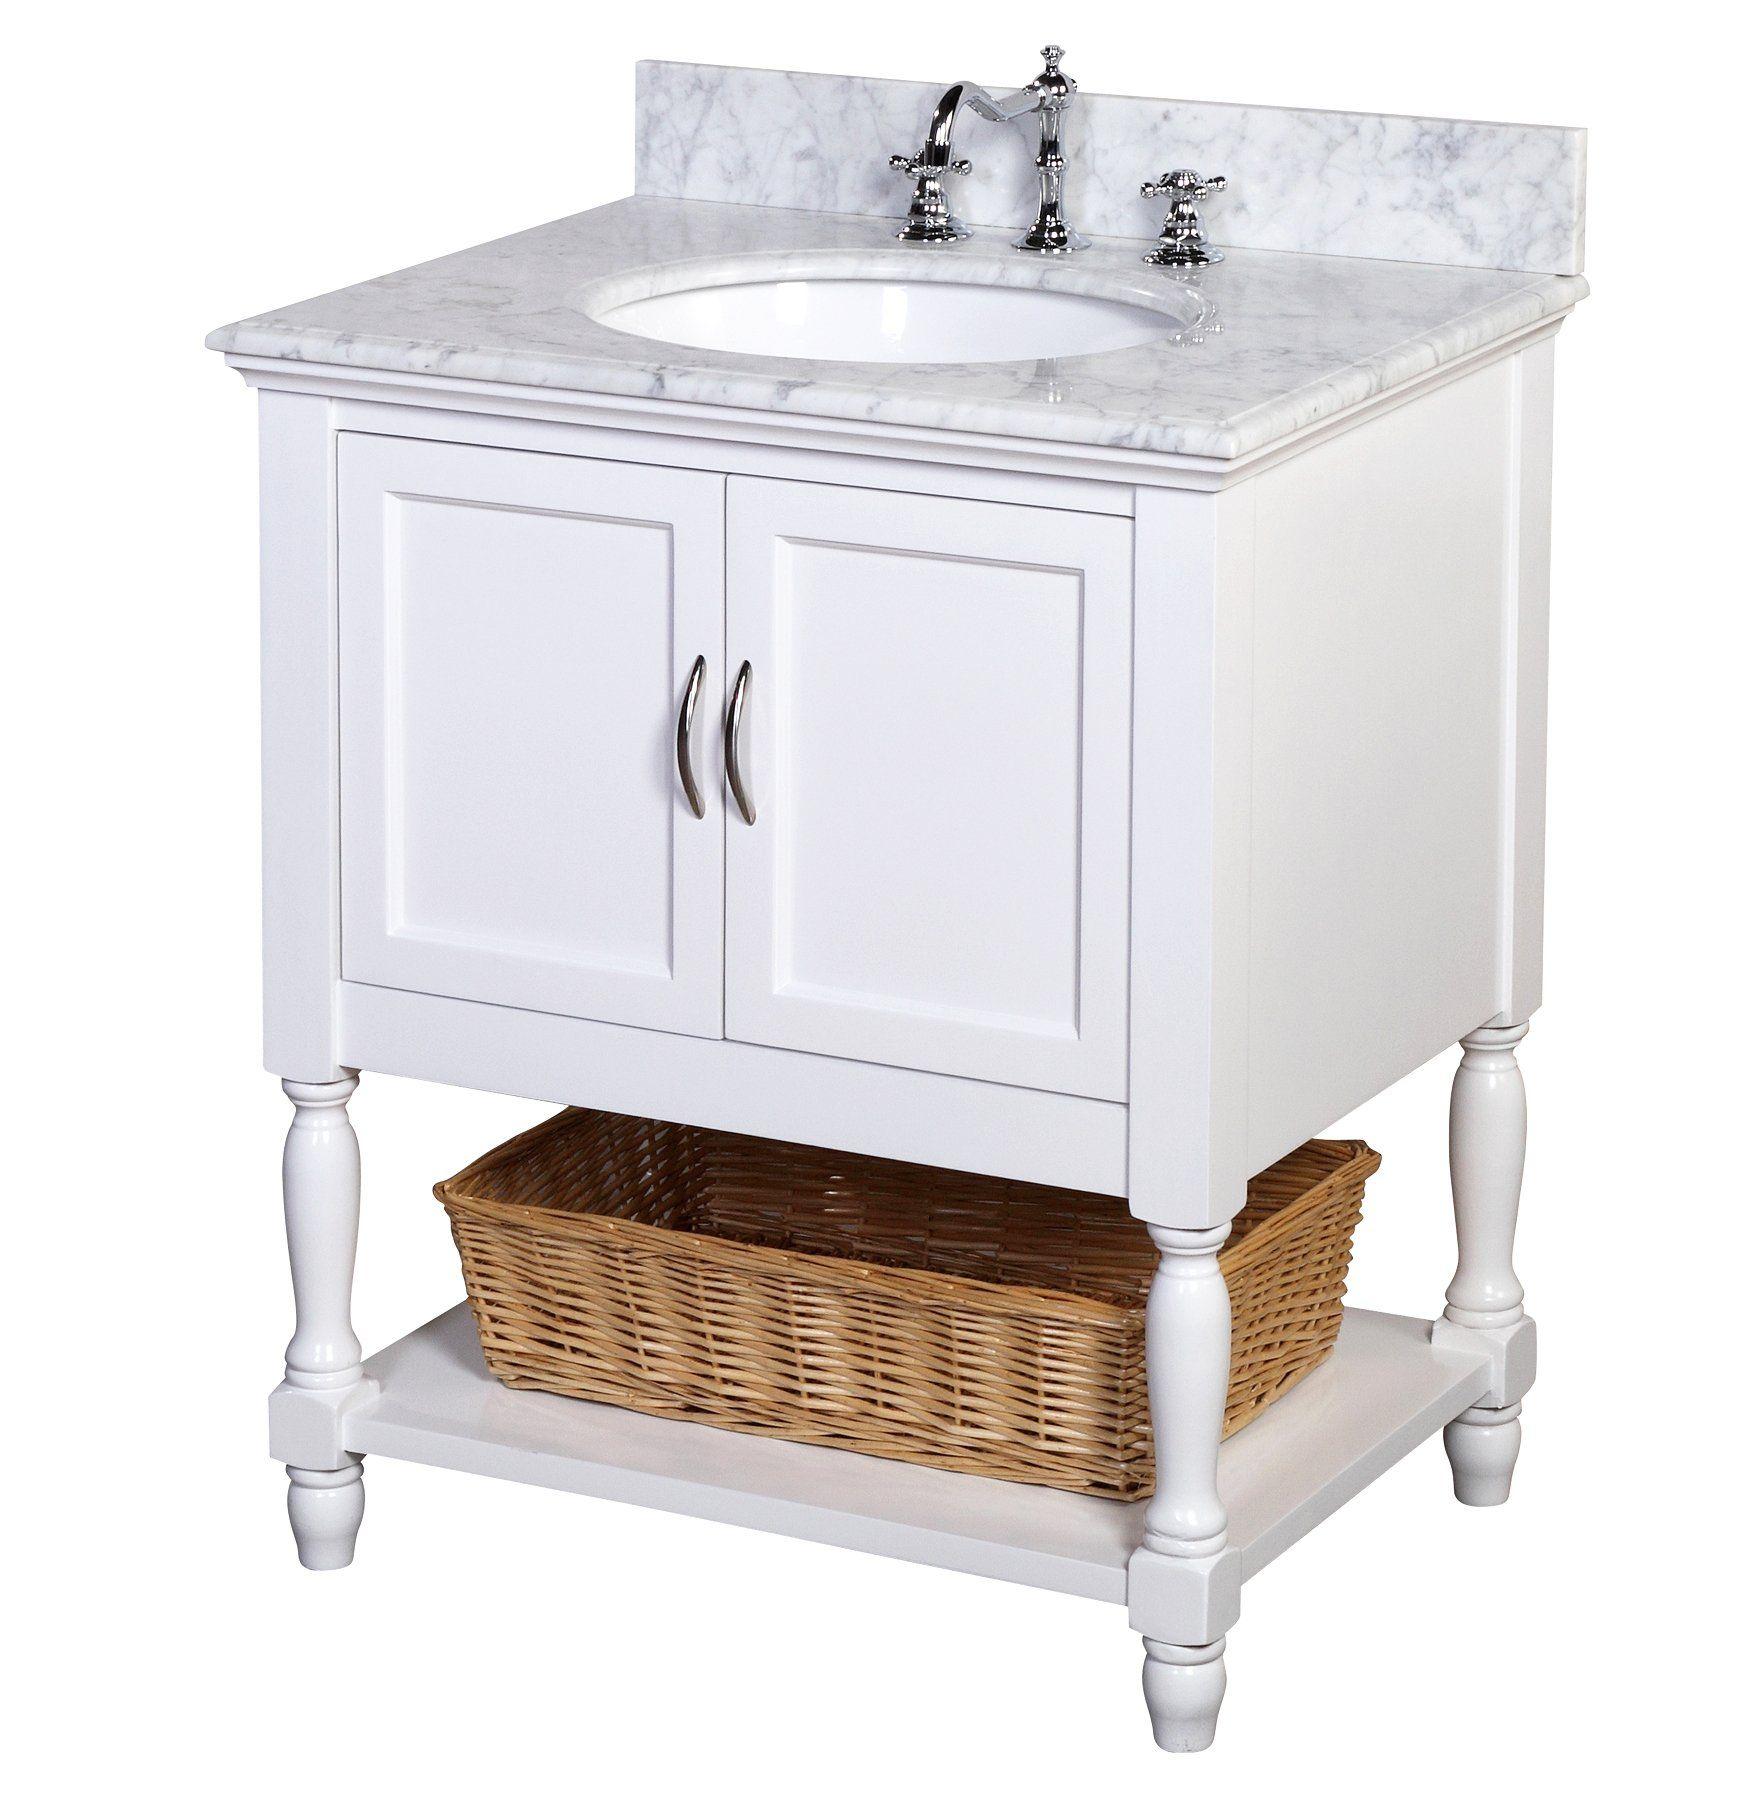 Beverly 30 Inch Bathroom Vanity Carrara White Includes An Italian Carrara Marble Countertop A 24 Inch Bathroom Vanity Single Bathroom Vanity 24 Inch Vanity